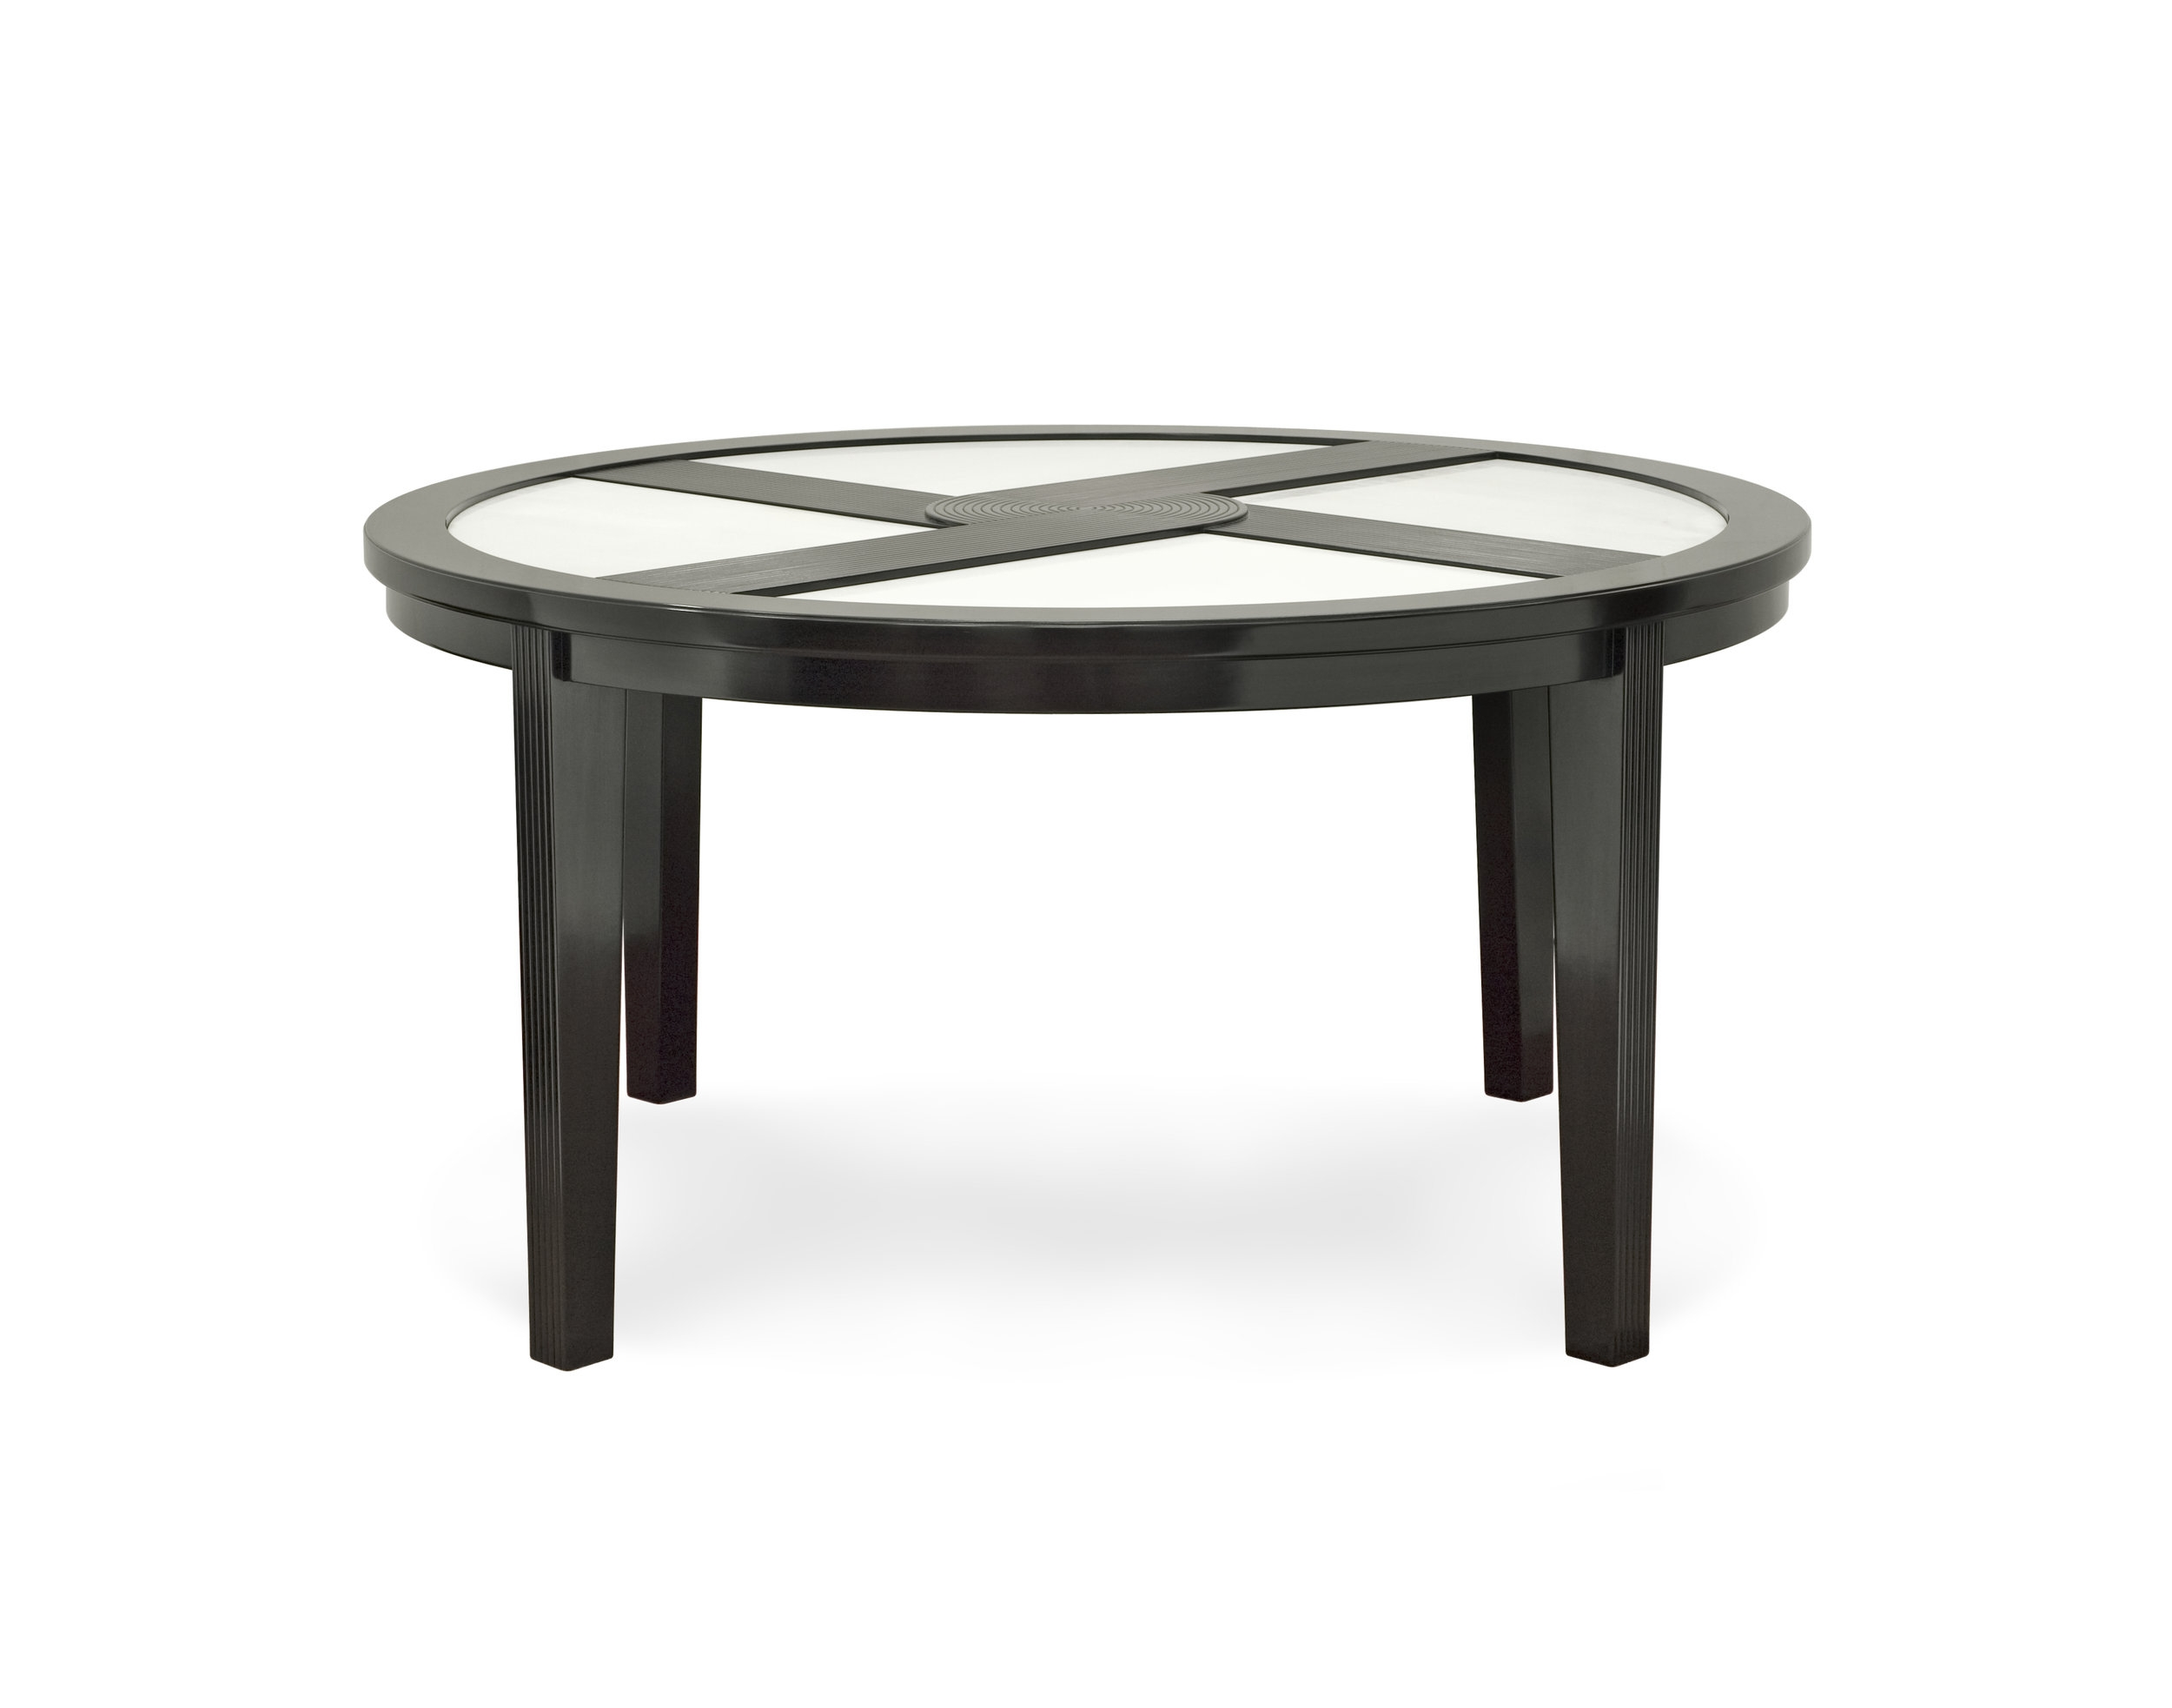 ....Art Deco Style furniture : Round Dining Table..艺术装饰风格家具: 圆餐台....